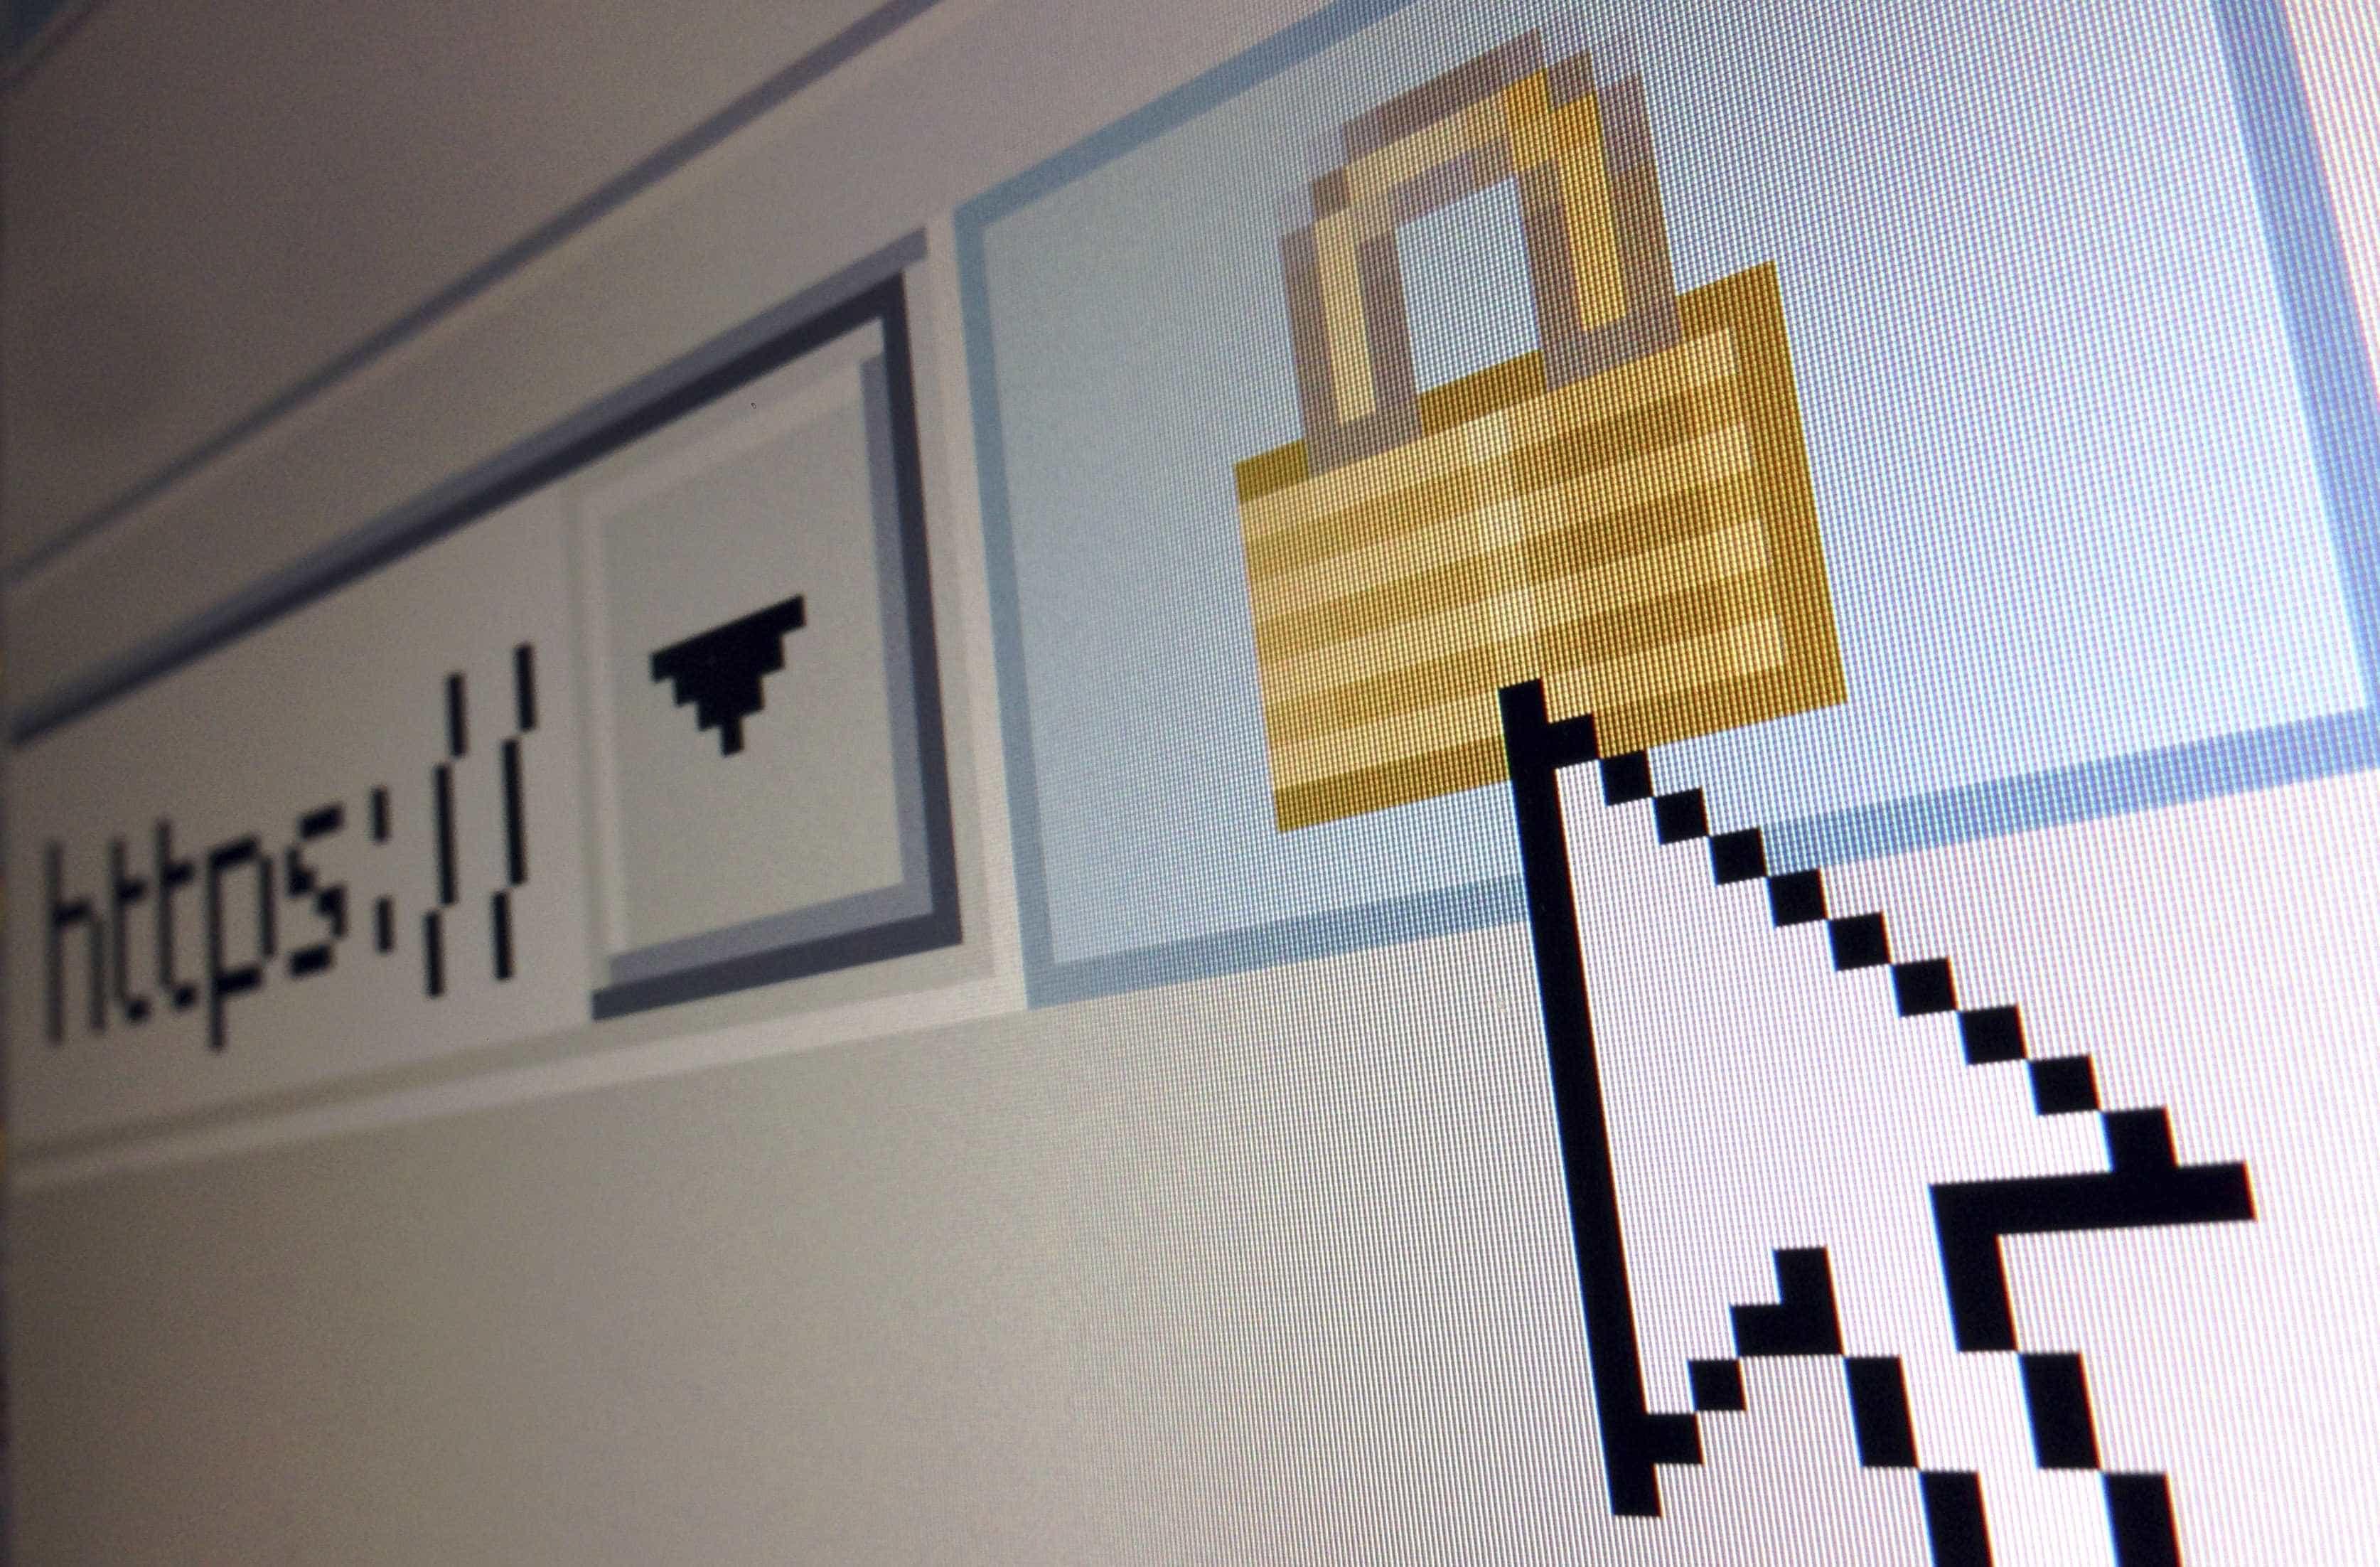 Descoberta nova vulnerabilidade no Internet Explorer